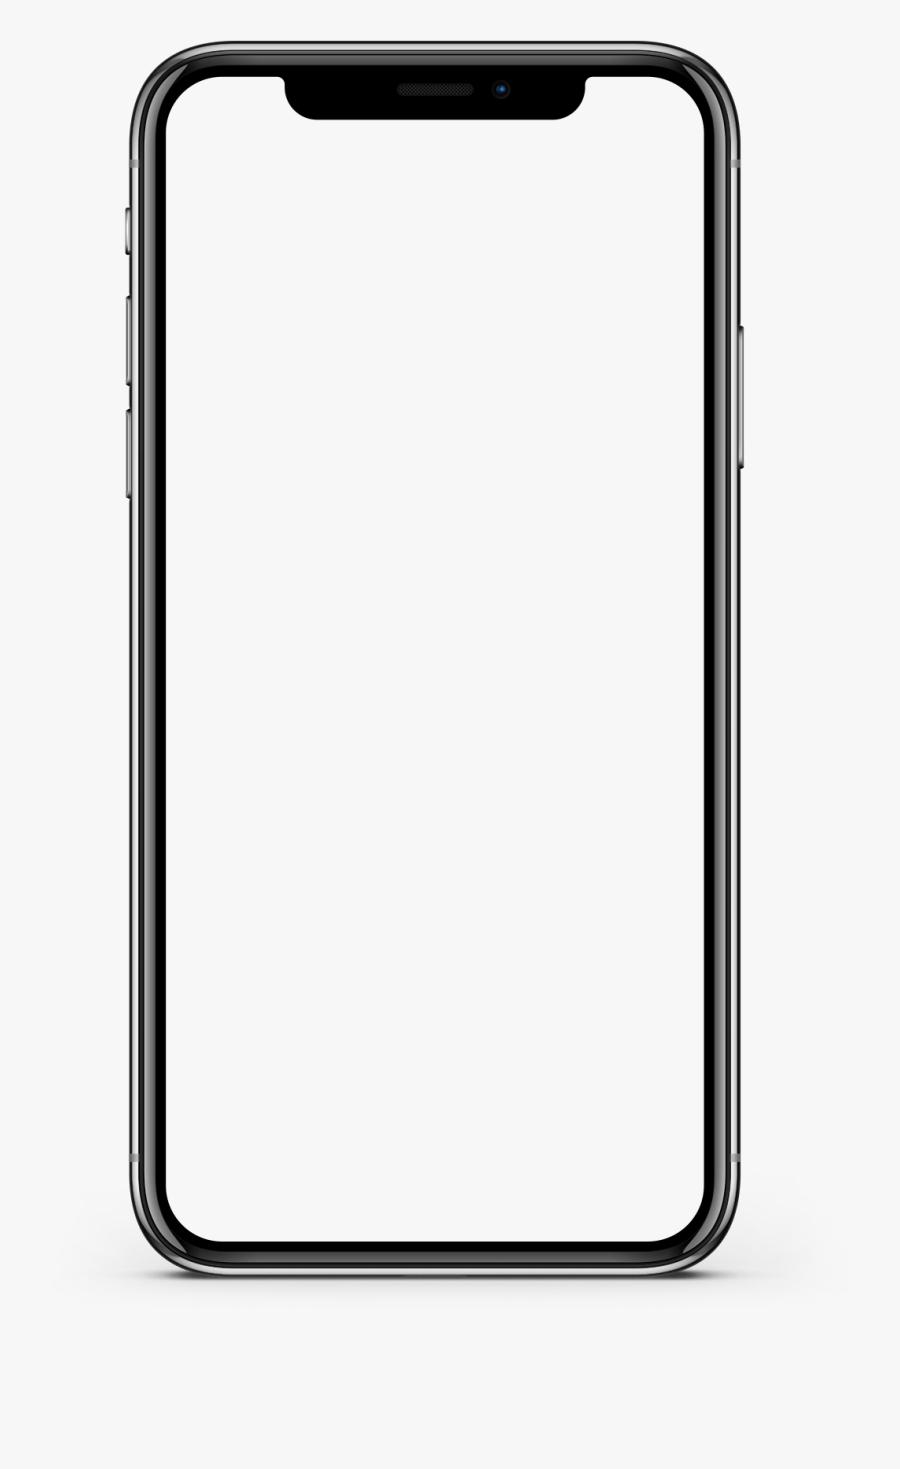 Iphone X Screen Mockup - Iphone 10 Mockup Png, Transparent Clipart